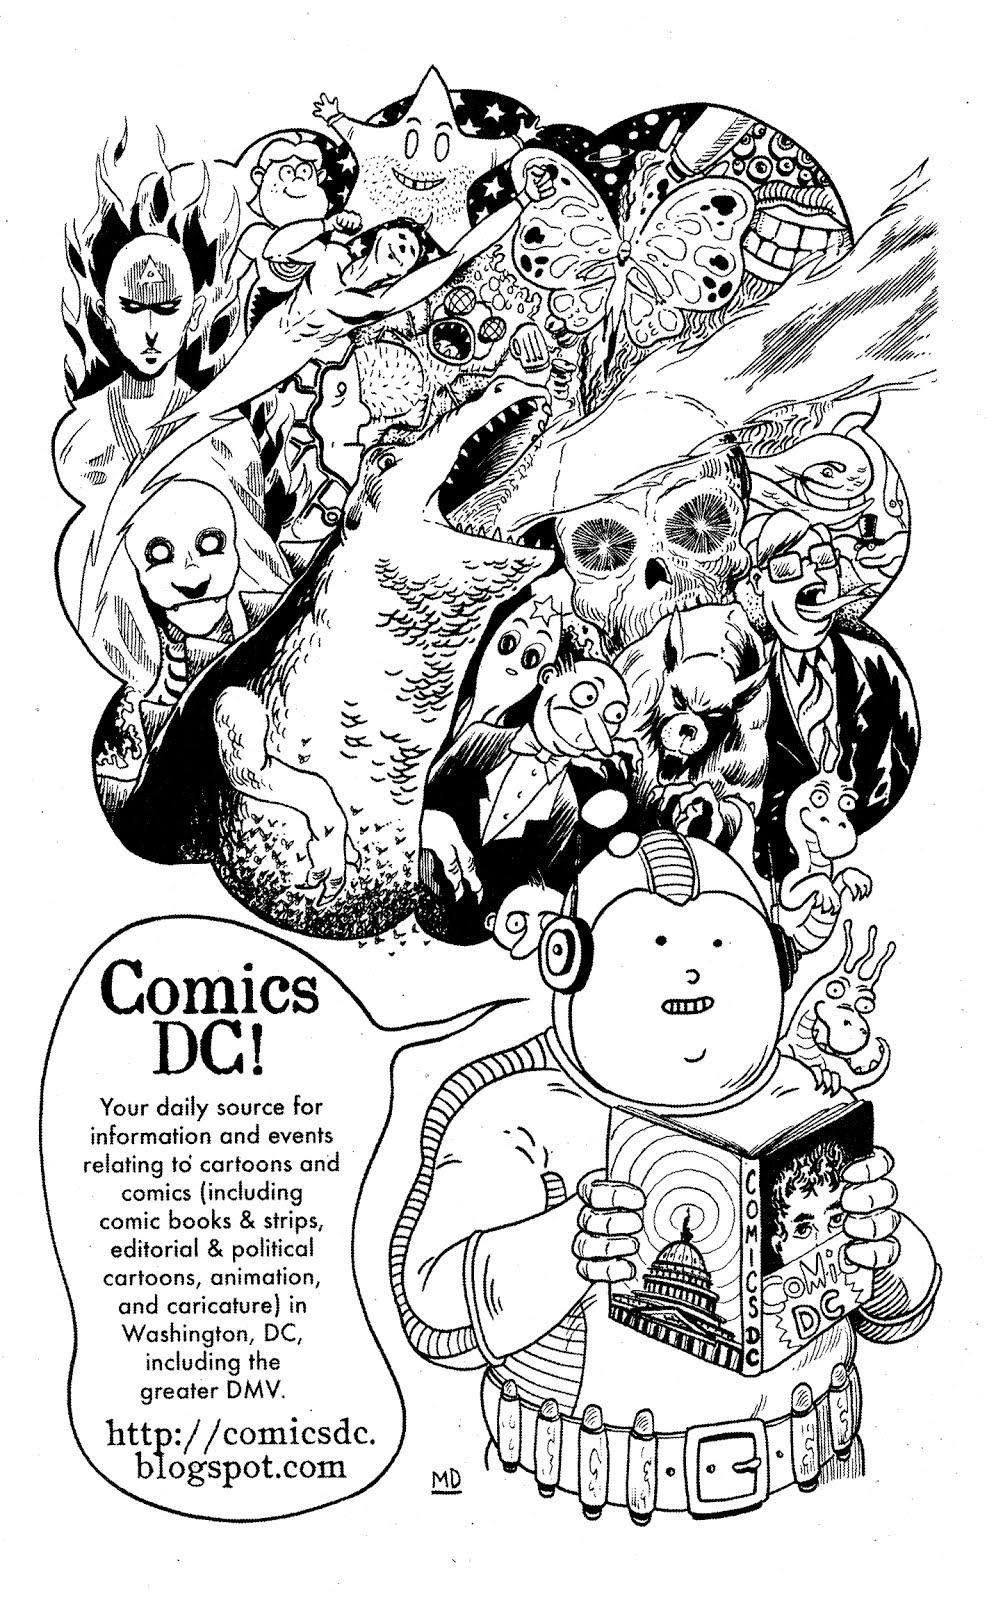 I Just Got A Copy Of The New Free Comics Newspaper Magic Bullet 15 Matt Dembicki Drew Ad For Us